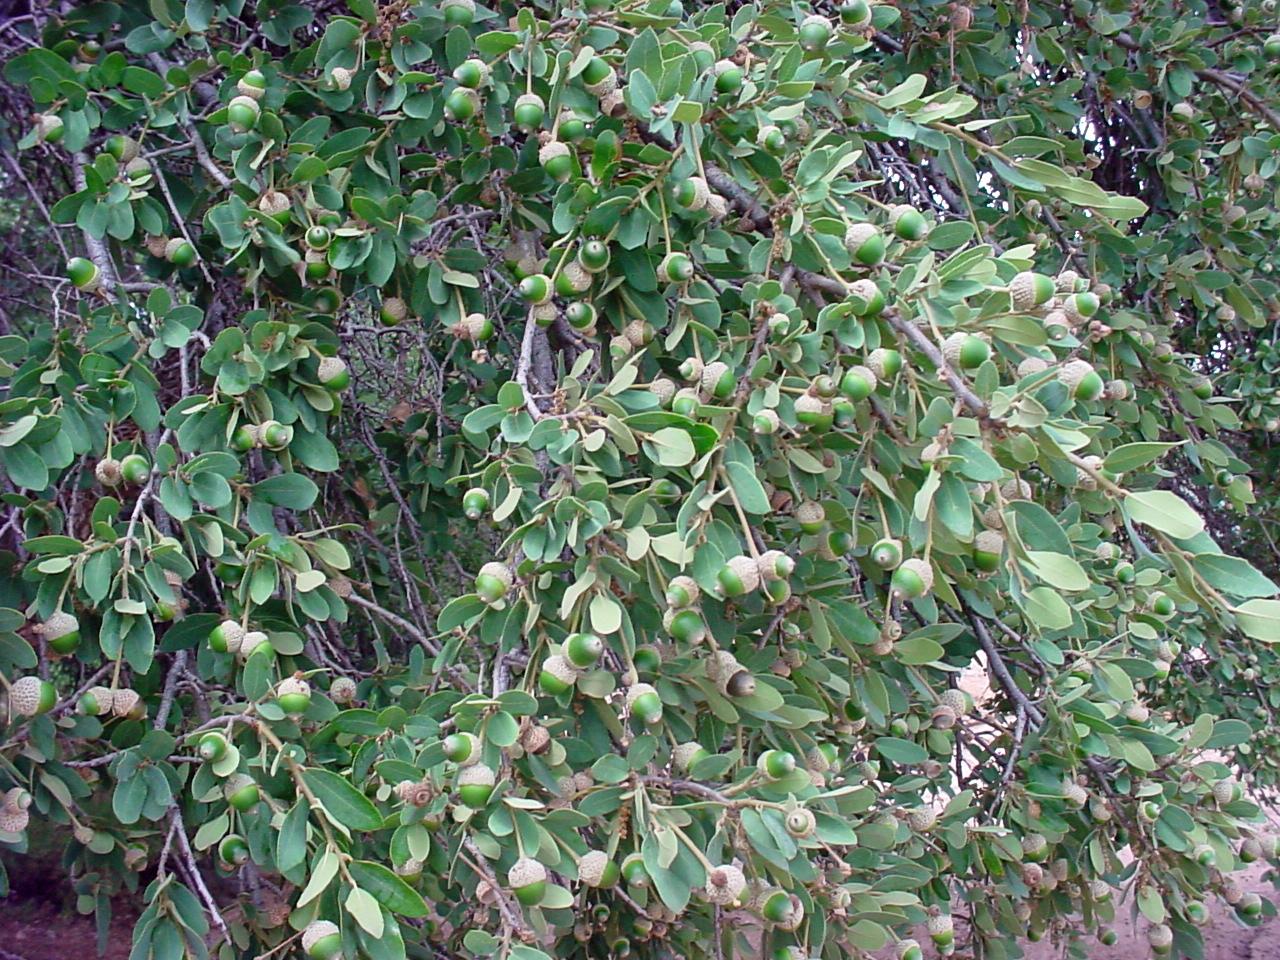 - quercus griseagrey oak